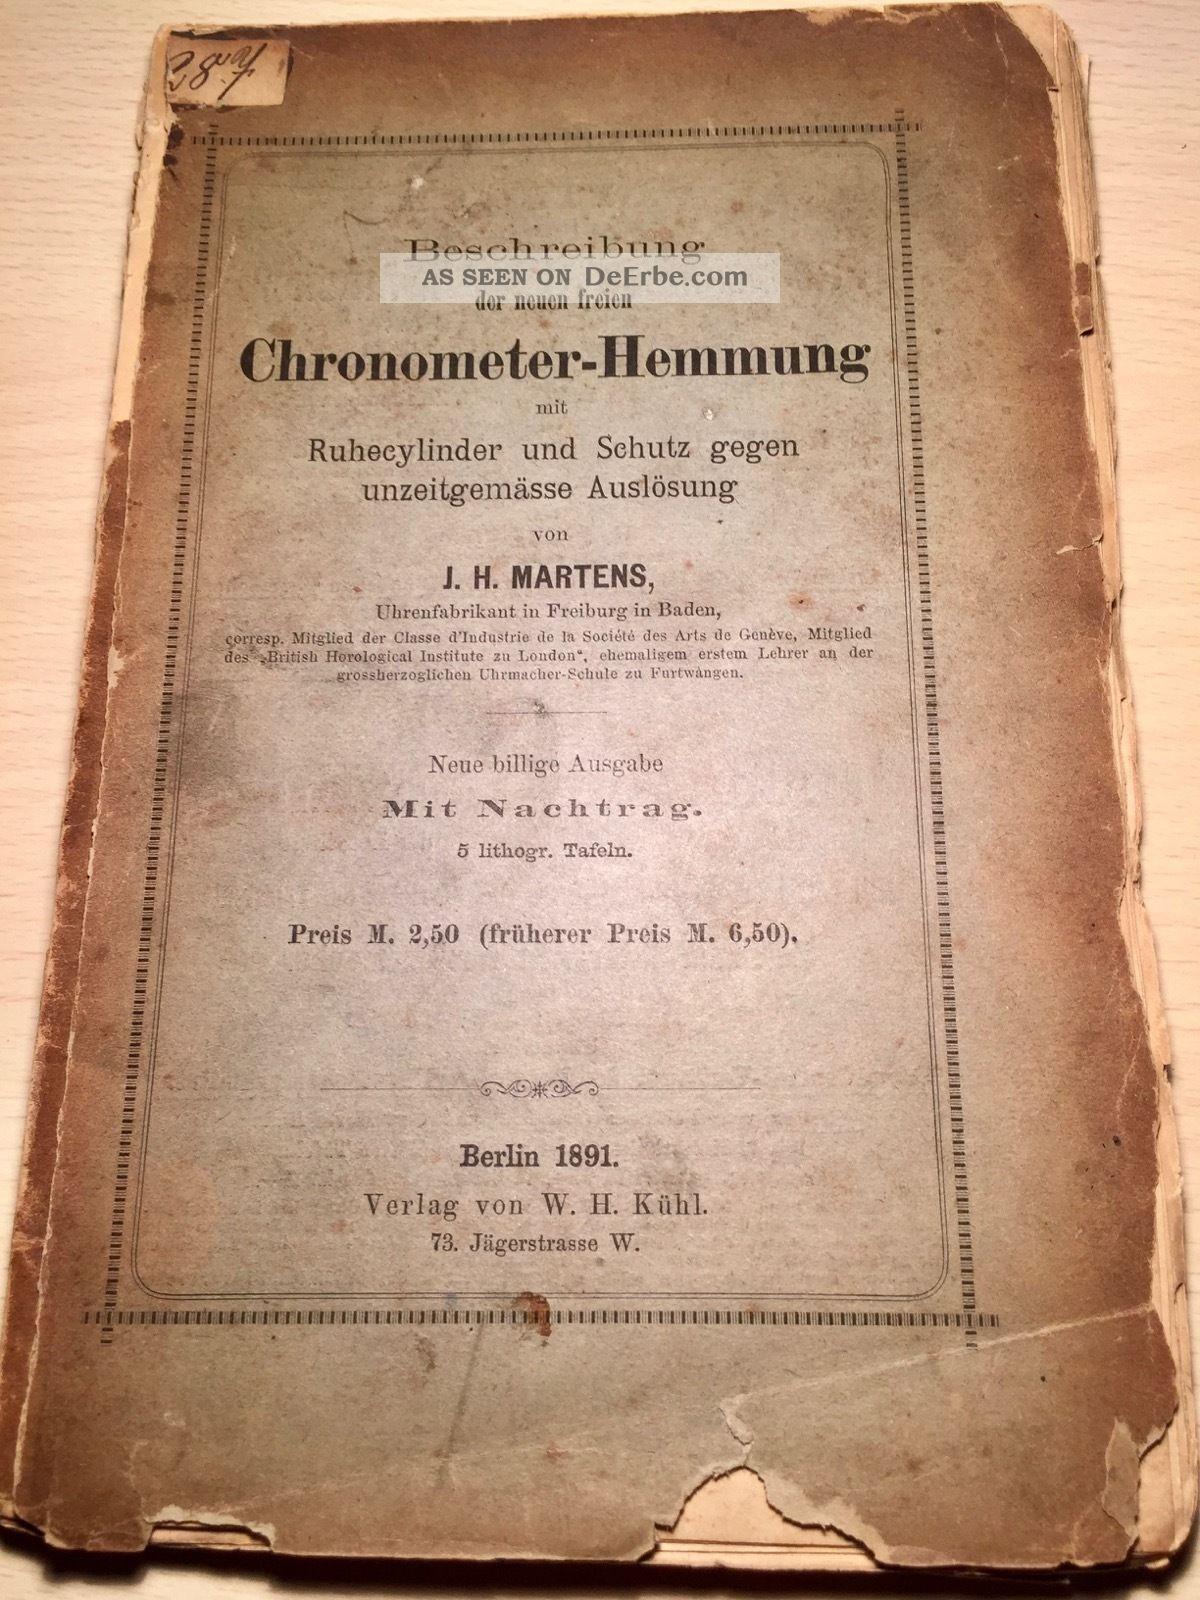 Beschreibung Der Neuen Freien Chronometer Hemmung,  J.  H.  Martens 1891 Alte Berufe Bild